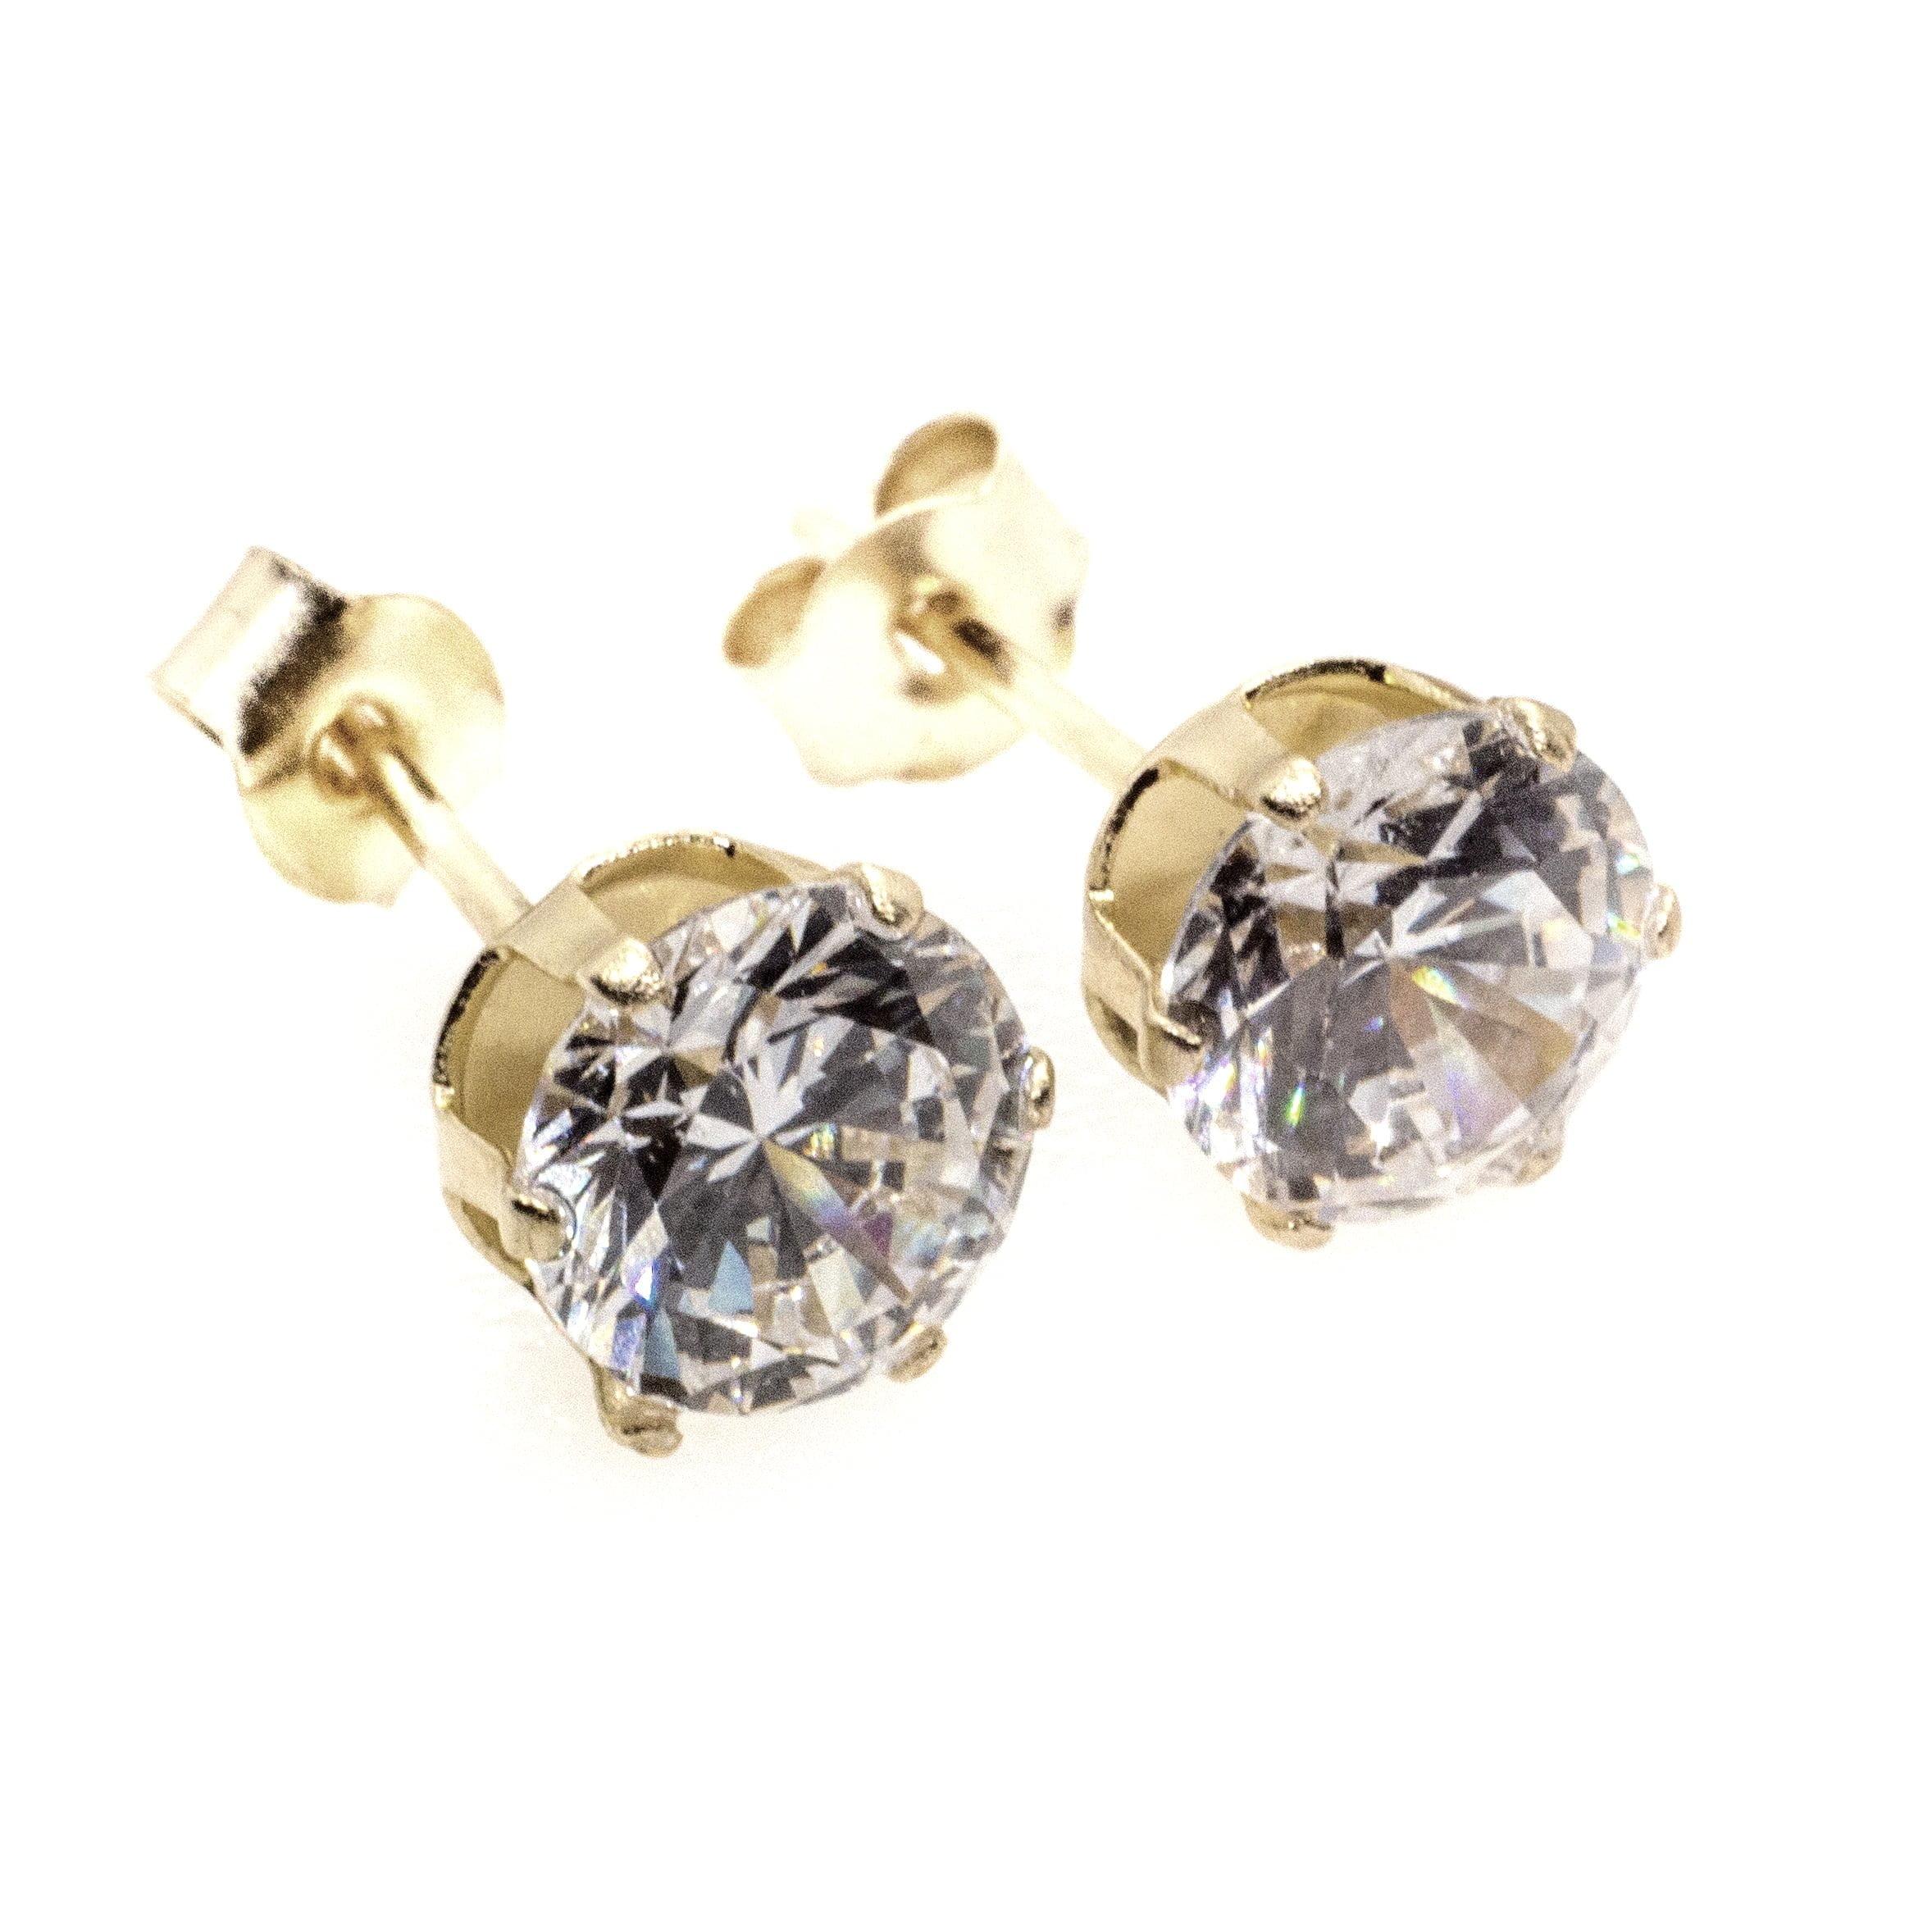 5mm CZ stud earrings 9ct yellow gold alt 3